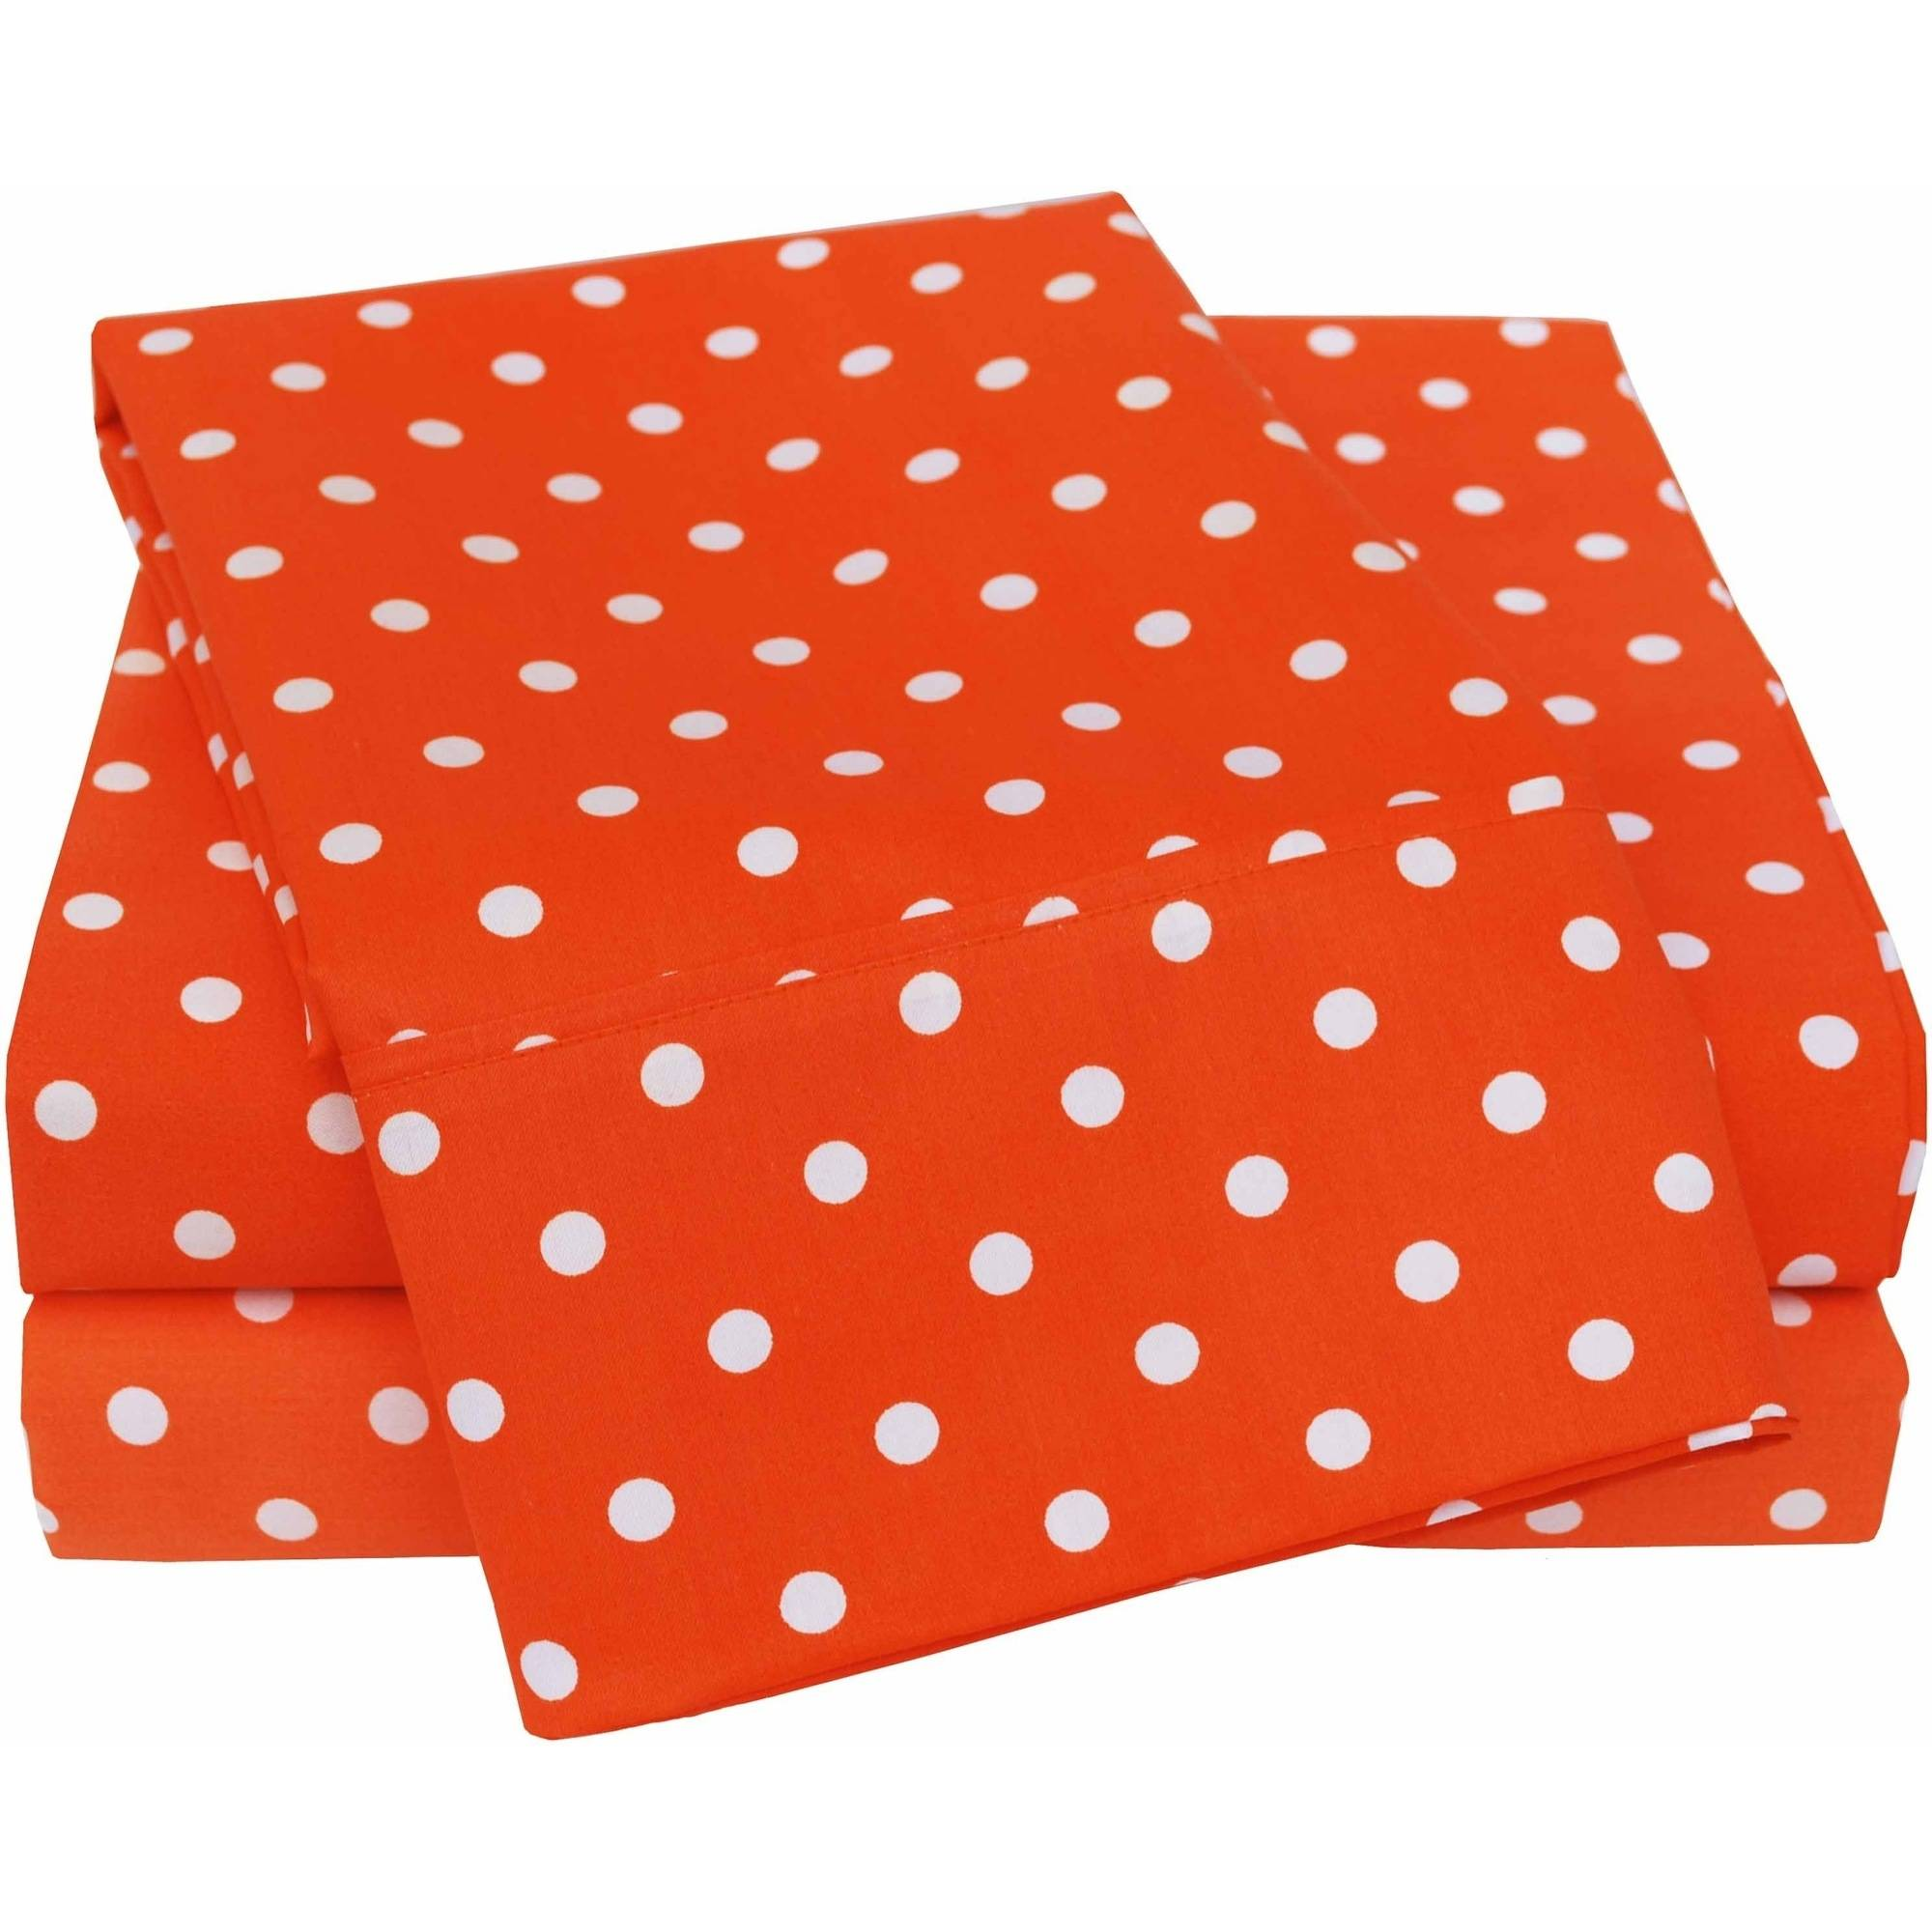 Superior 600 Thread Count Wrinkle-Resistant Luxury Cotton Polka Dots Design Sheet Set